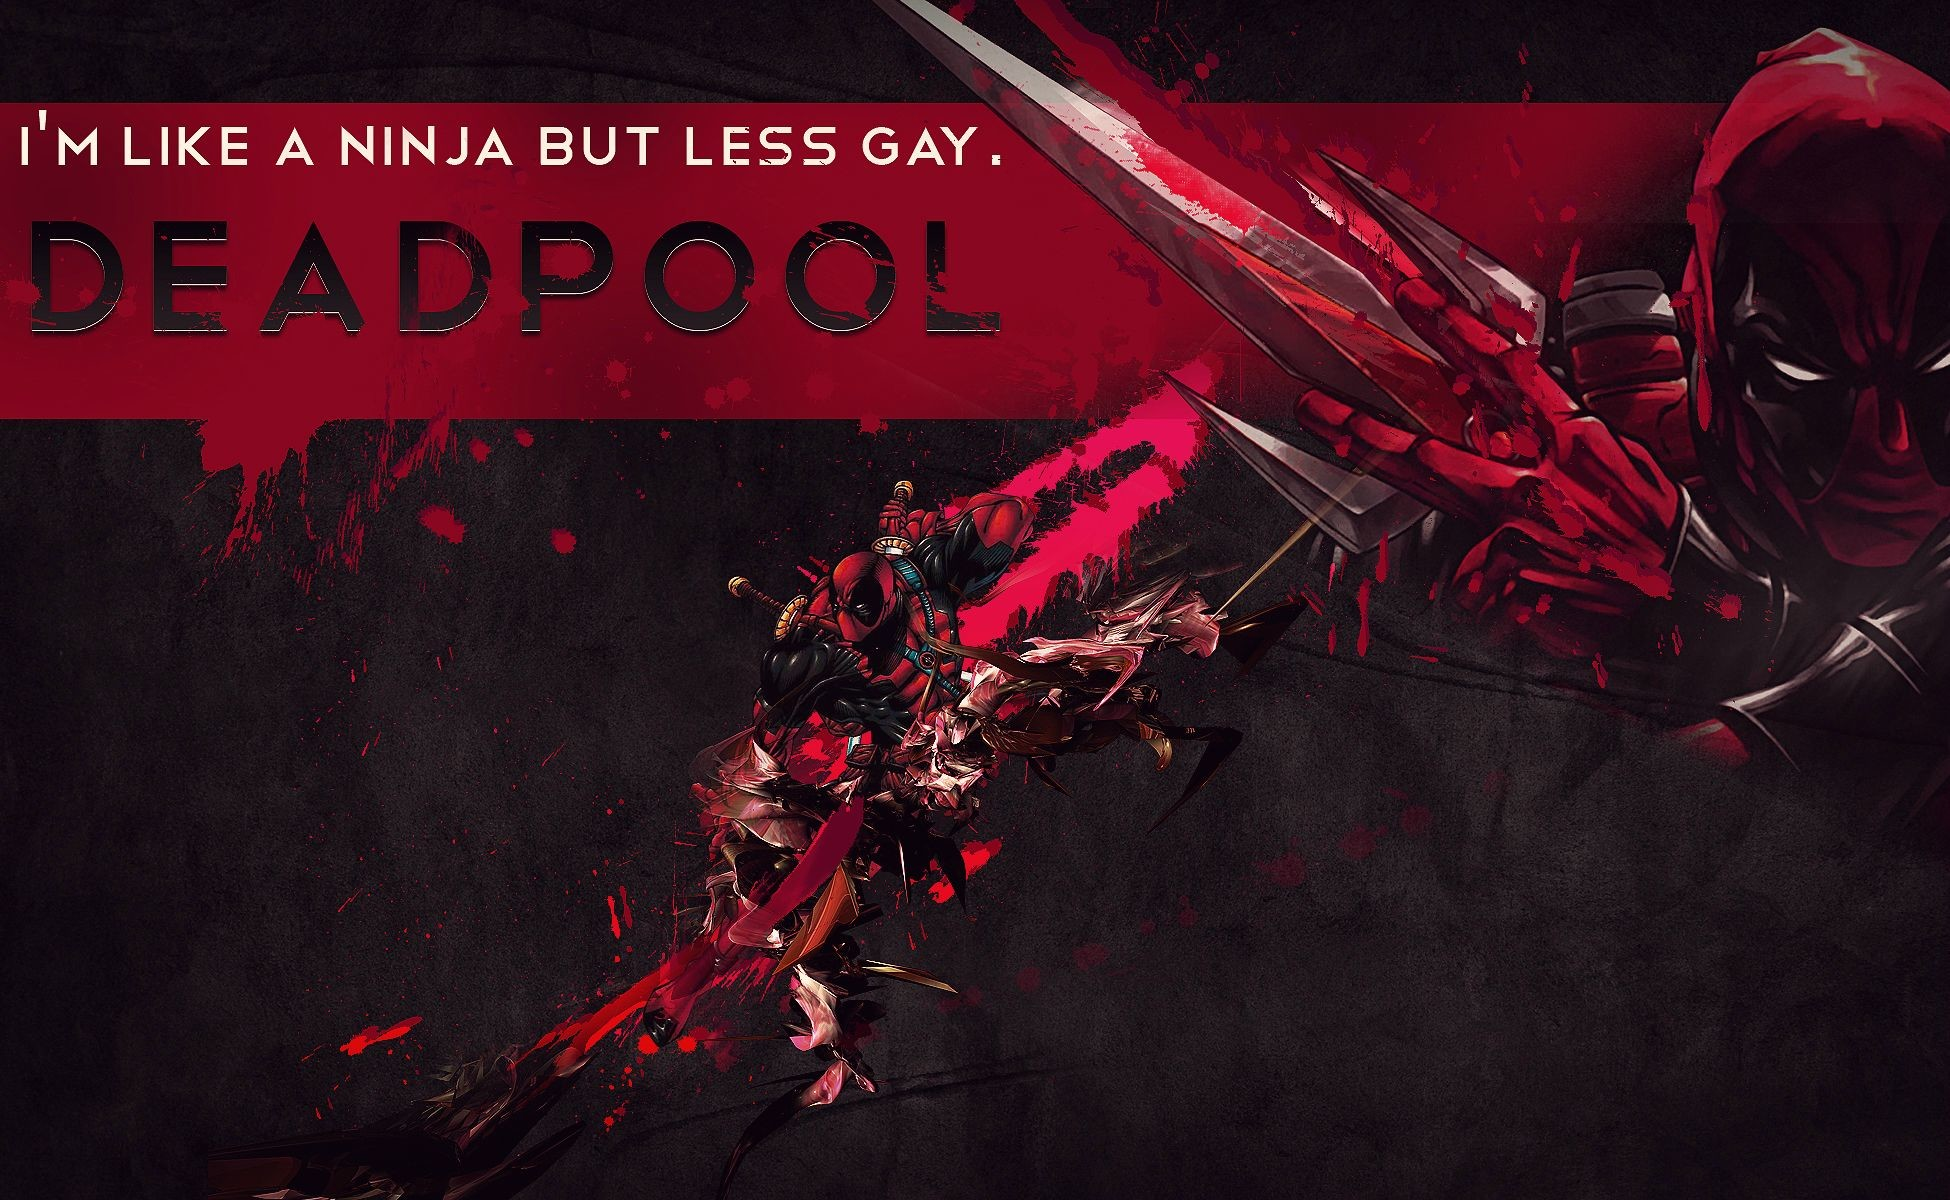 Res: 1950x1200, deadpool-ninja